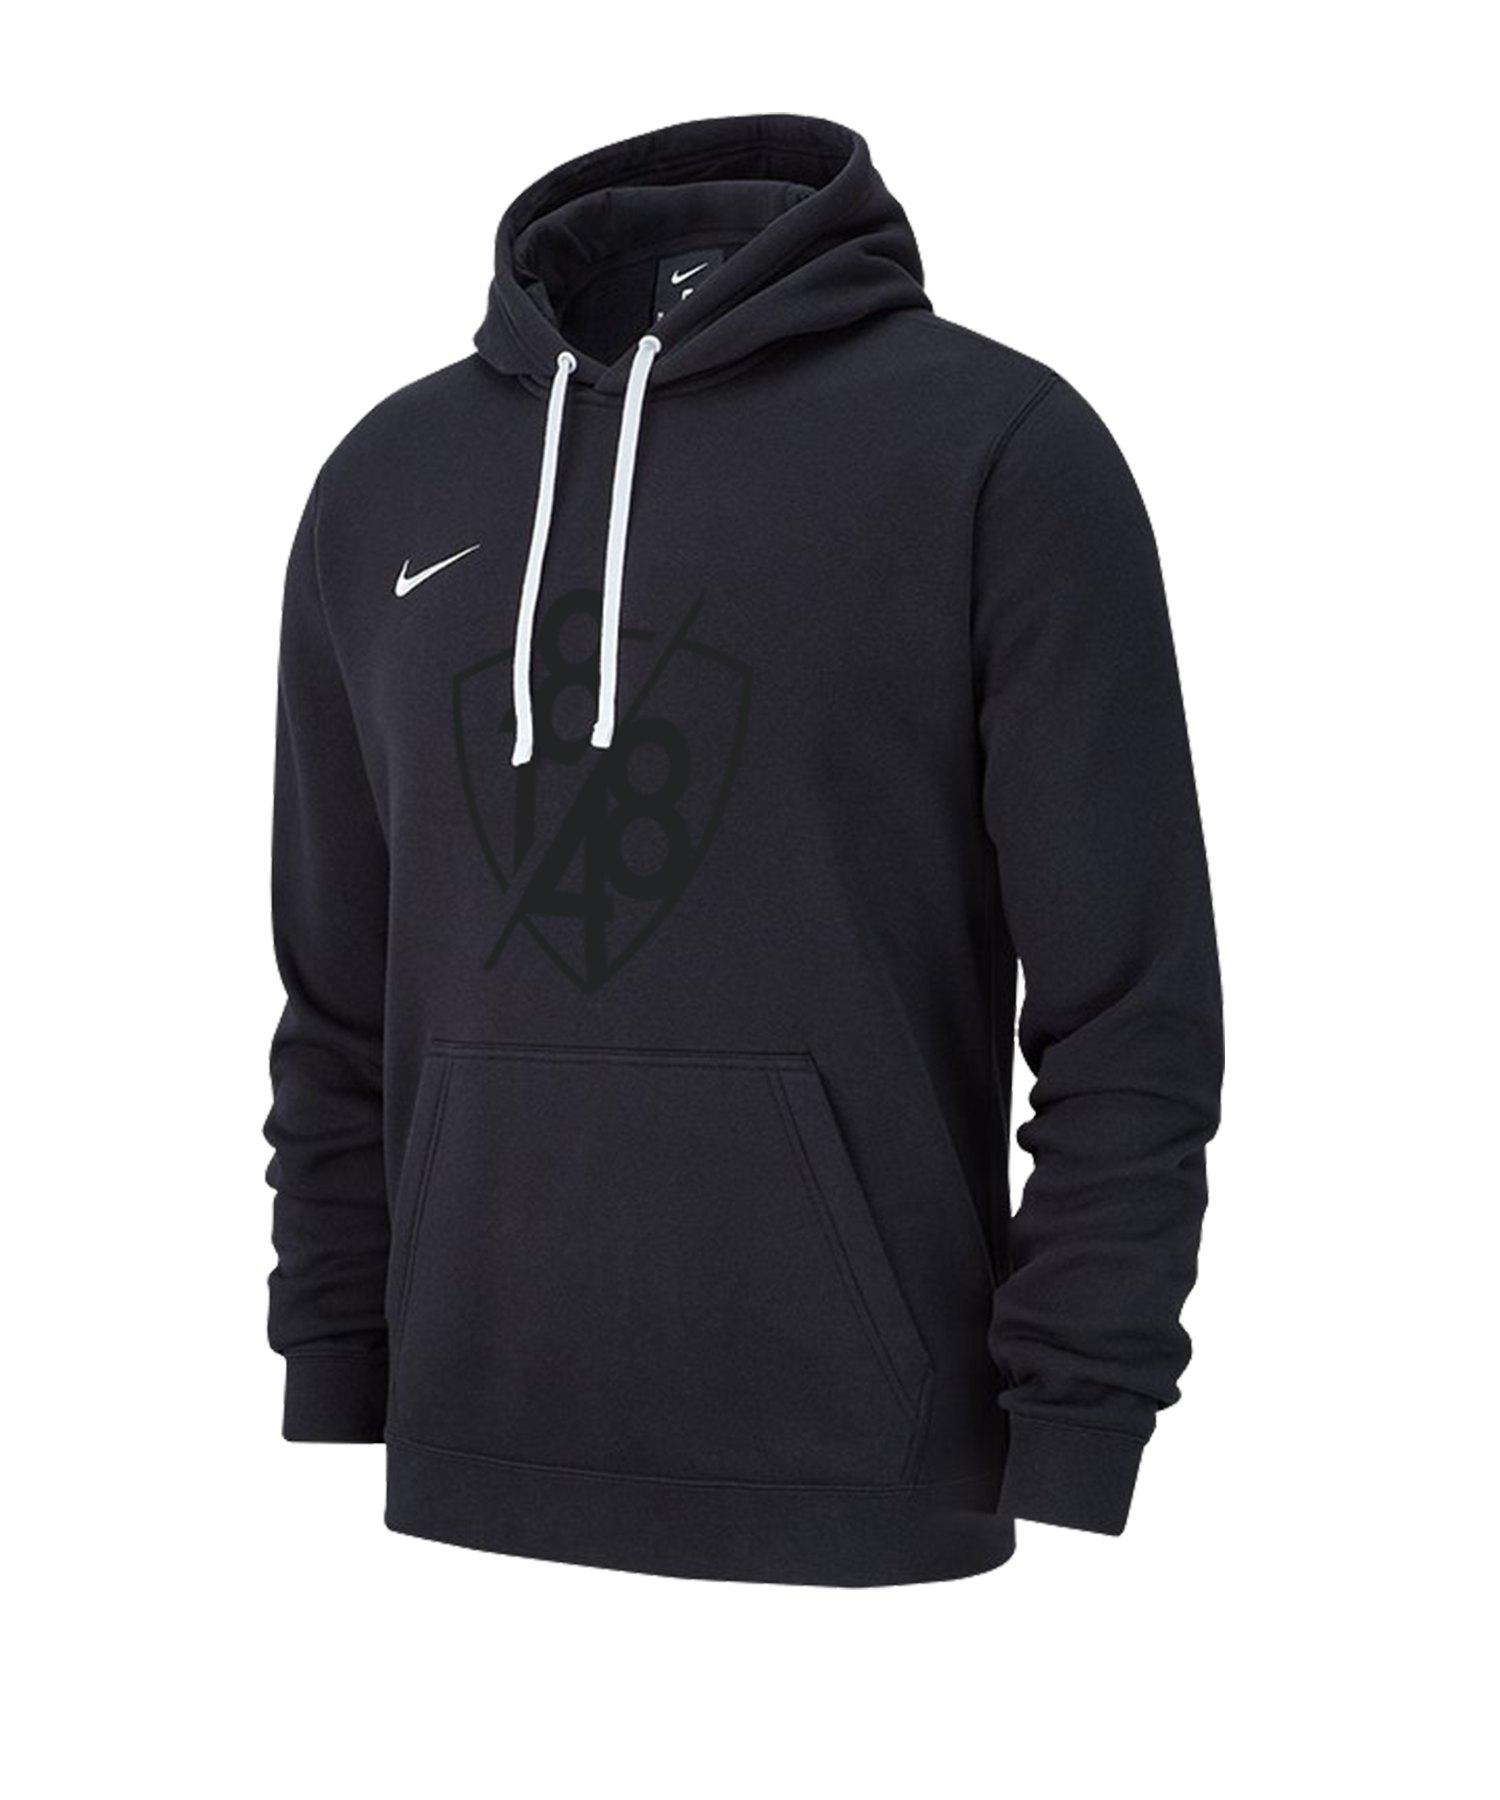 Nike VfL Bochum Kapuzensweatshirt Schwarz F010 - schwarz